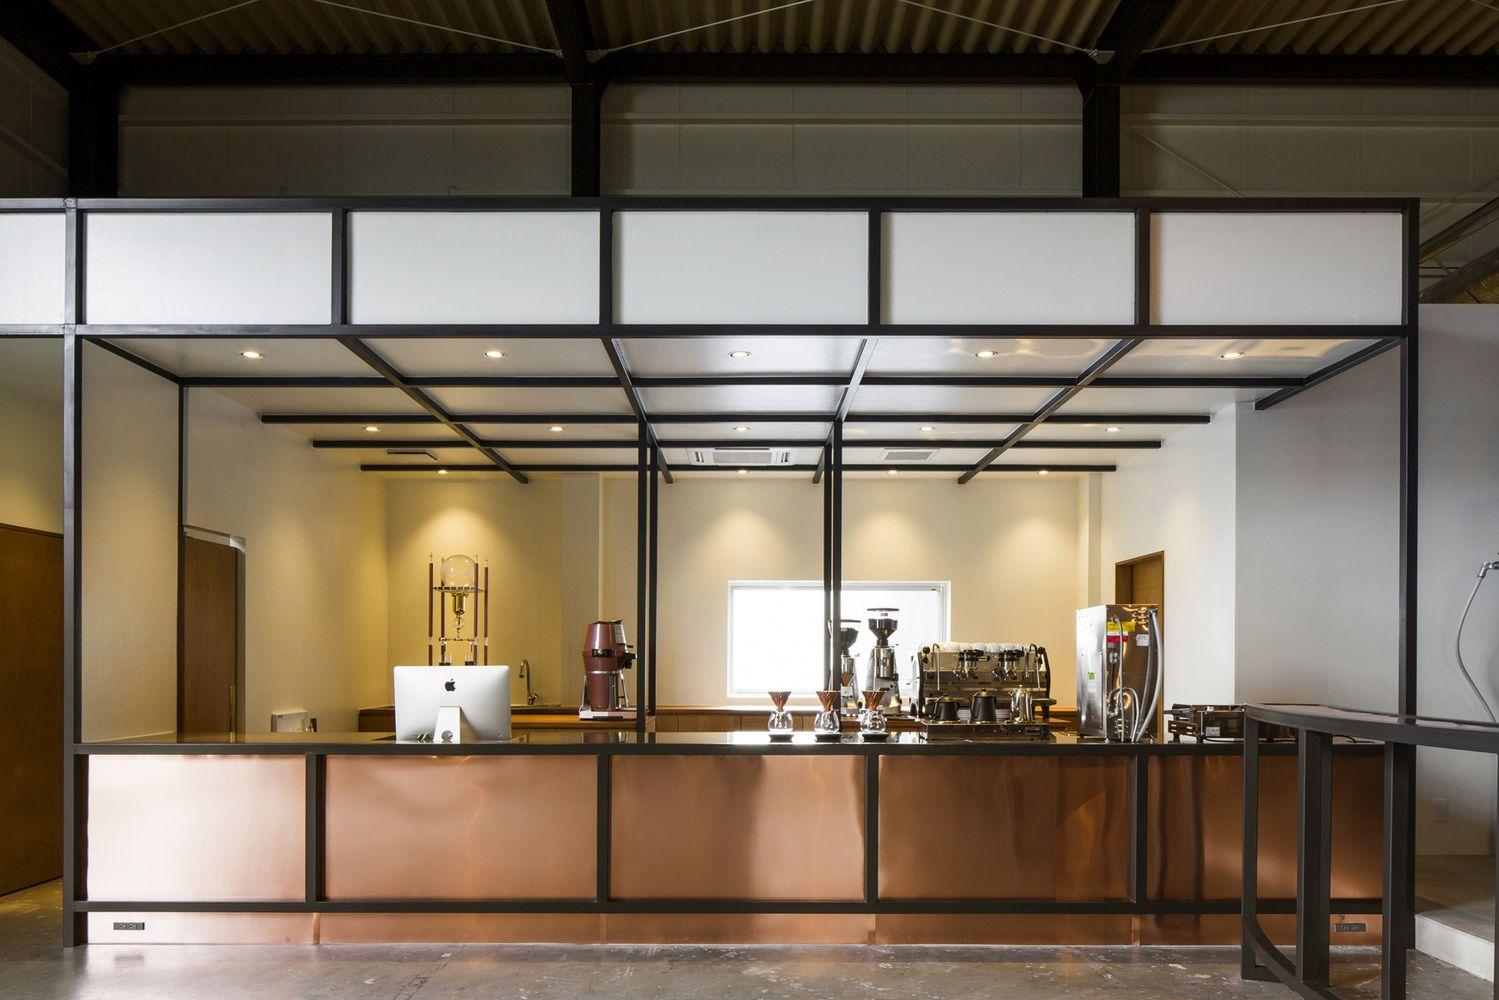 Gallery Of R Art Of Coffee  Iks Design  4  Japan Design Coffee Glamorous Coffee Shop Kitchen Design Inspiration Design